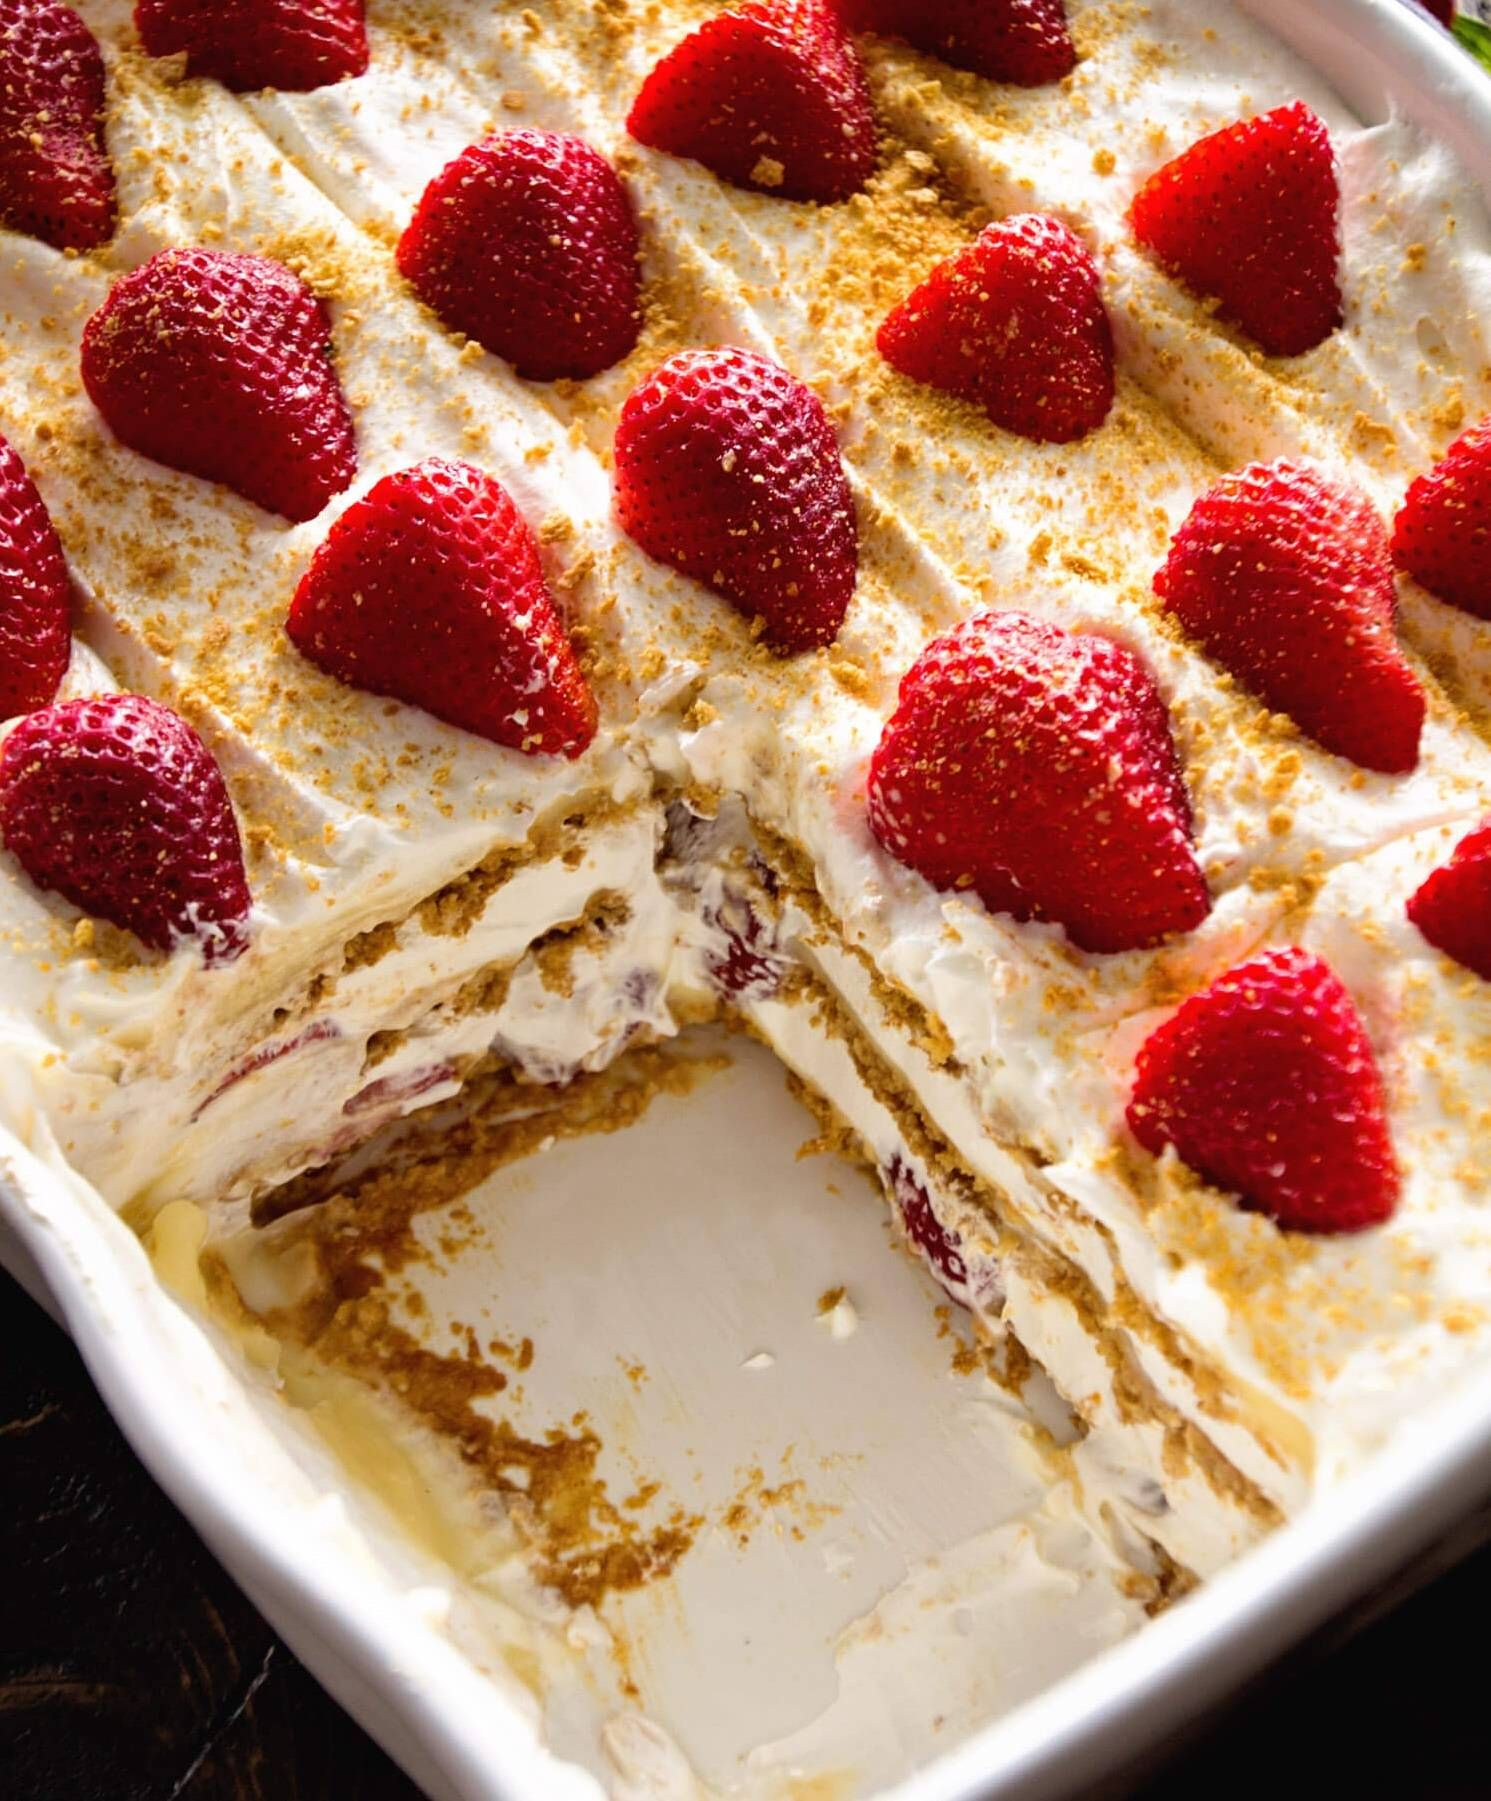 No Bake Strawberry Dessert Recipe: No Bake Graham Cracker Cheesycake